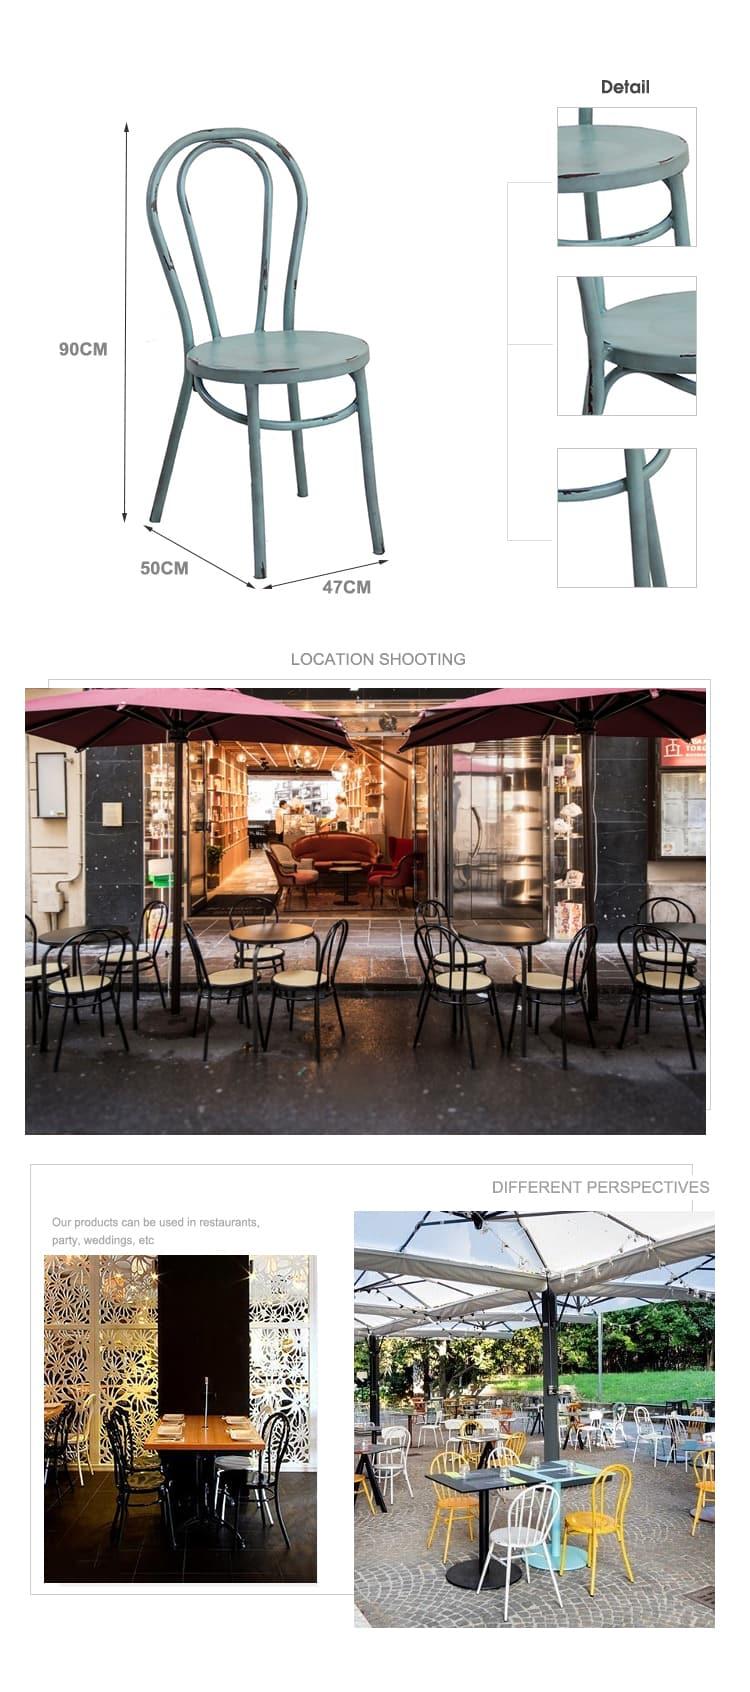 Silla de madera curvada Thonet de restaurante de café de aluminio 626CS-H45-ALU